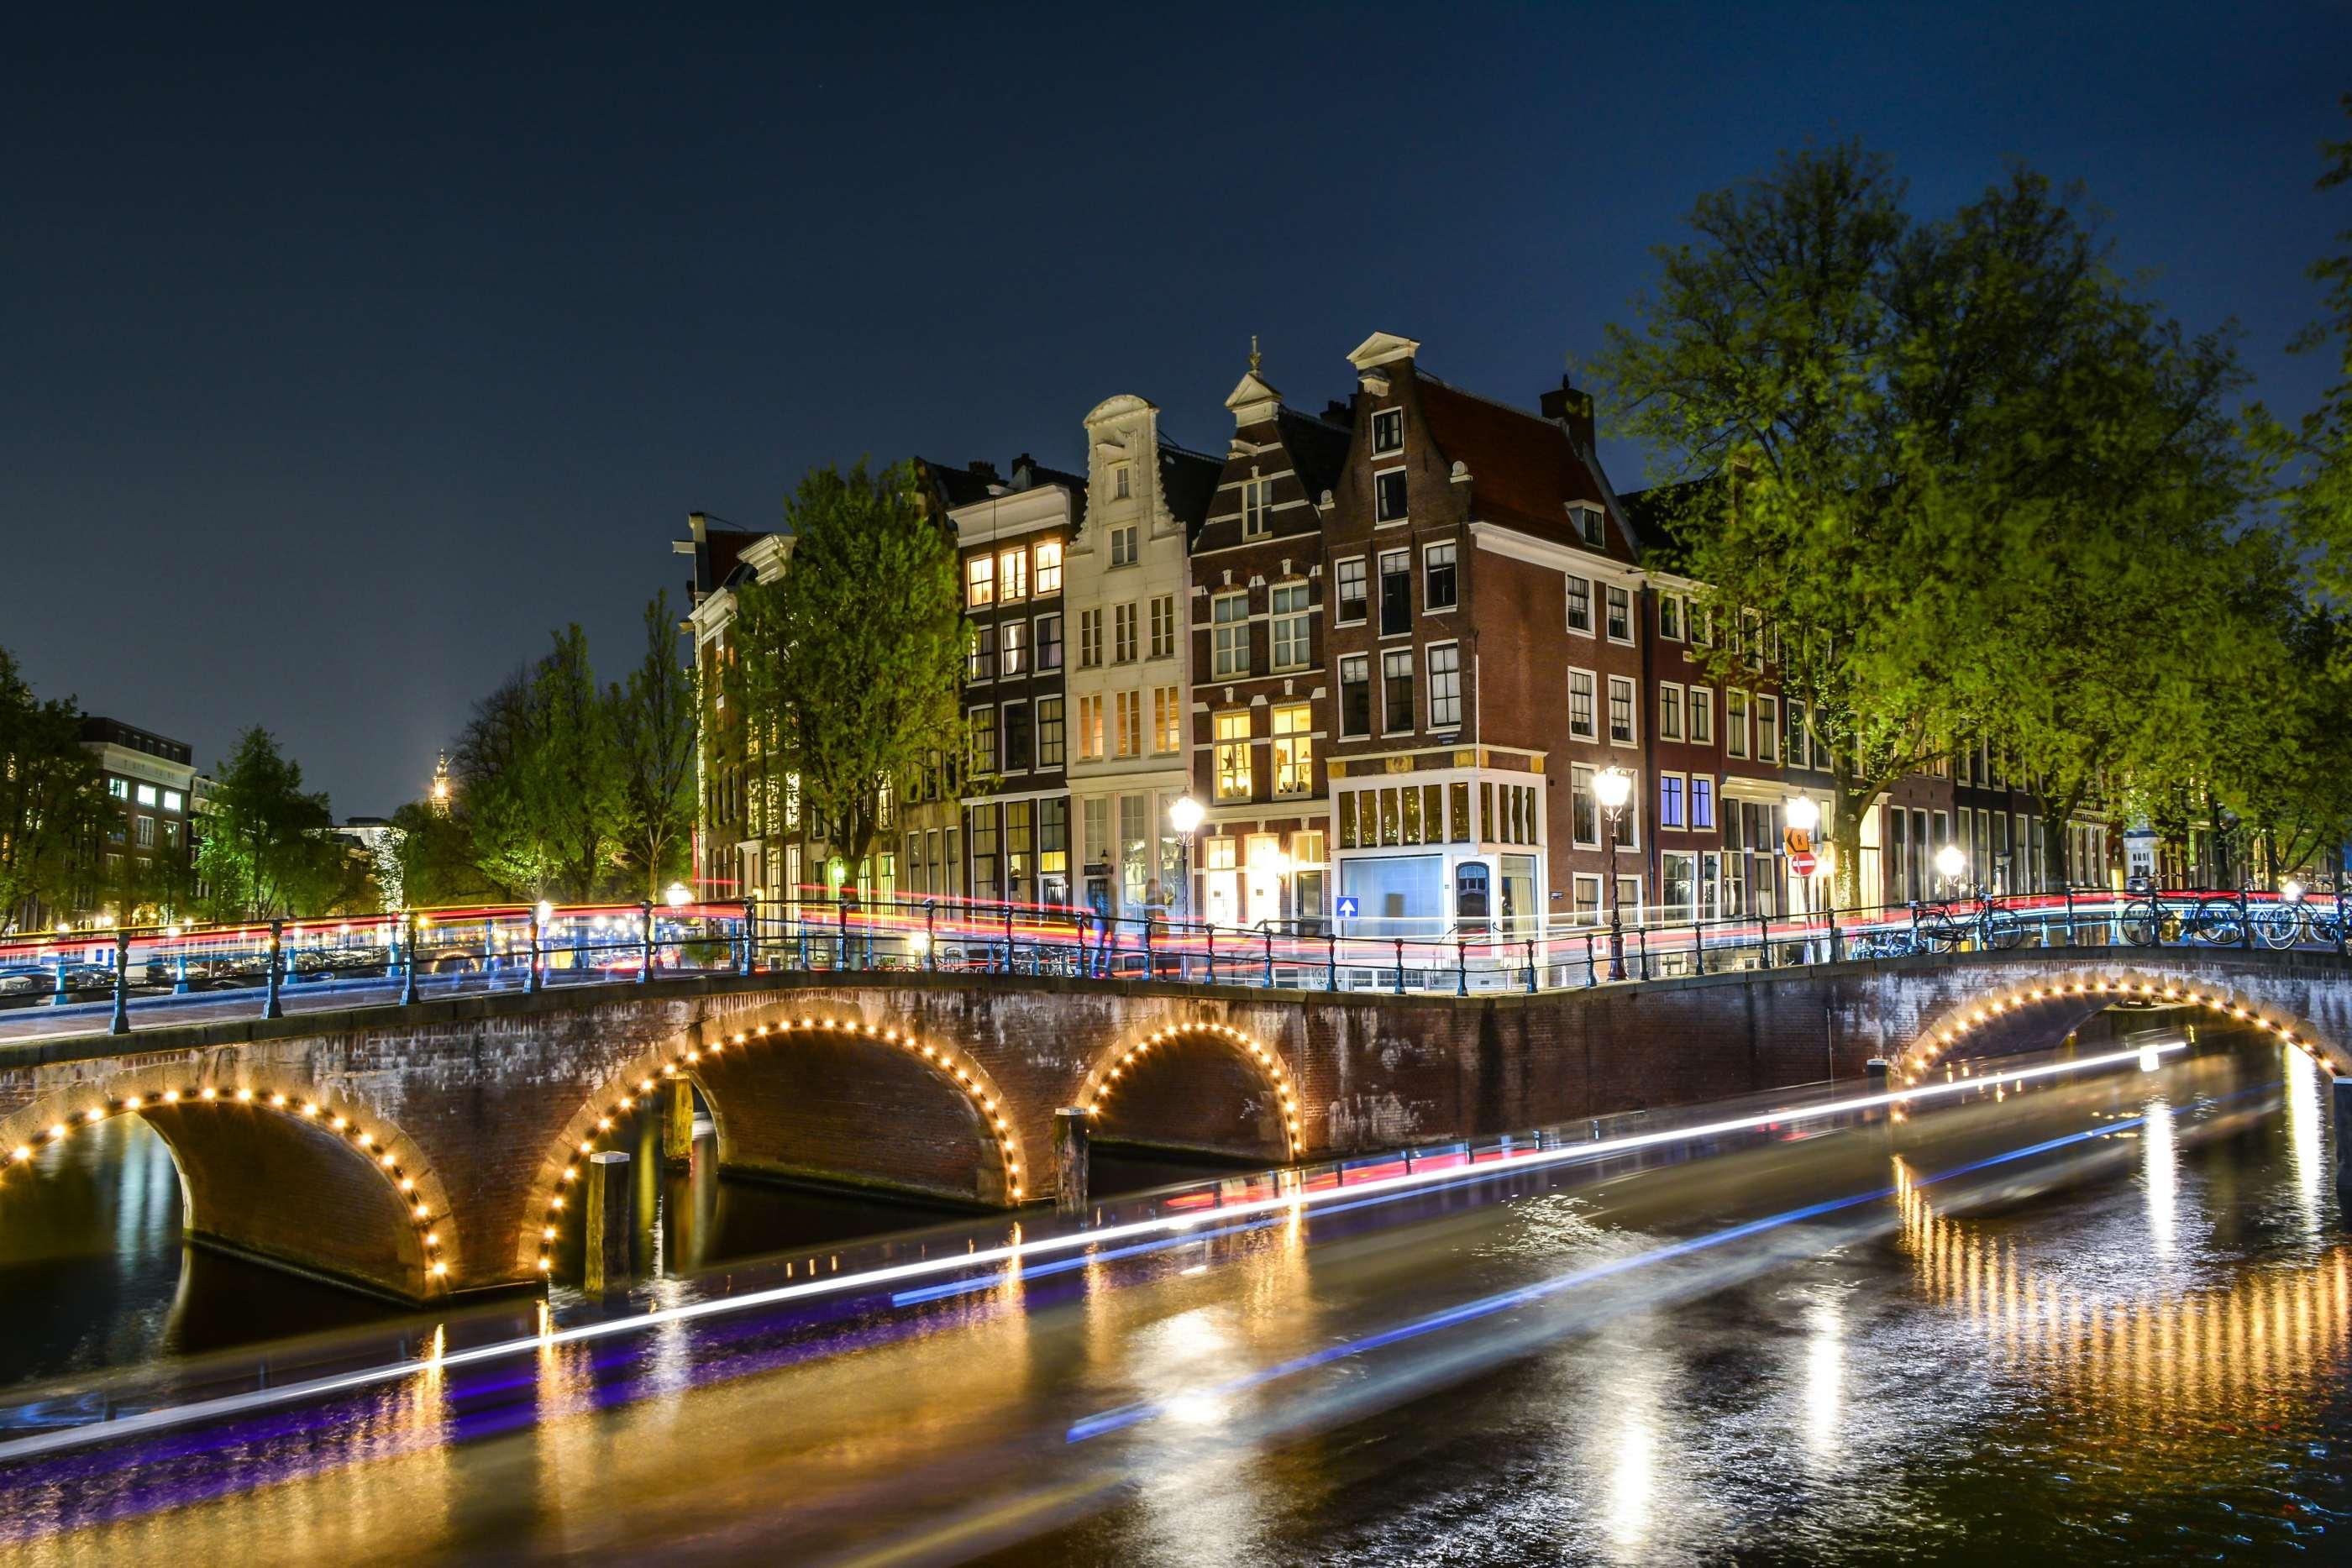 Amsterdam, Raphael Nogueira, CC0 unsplash